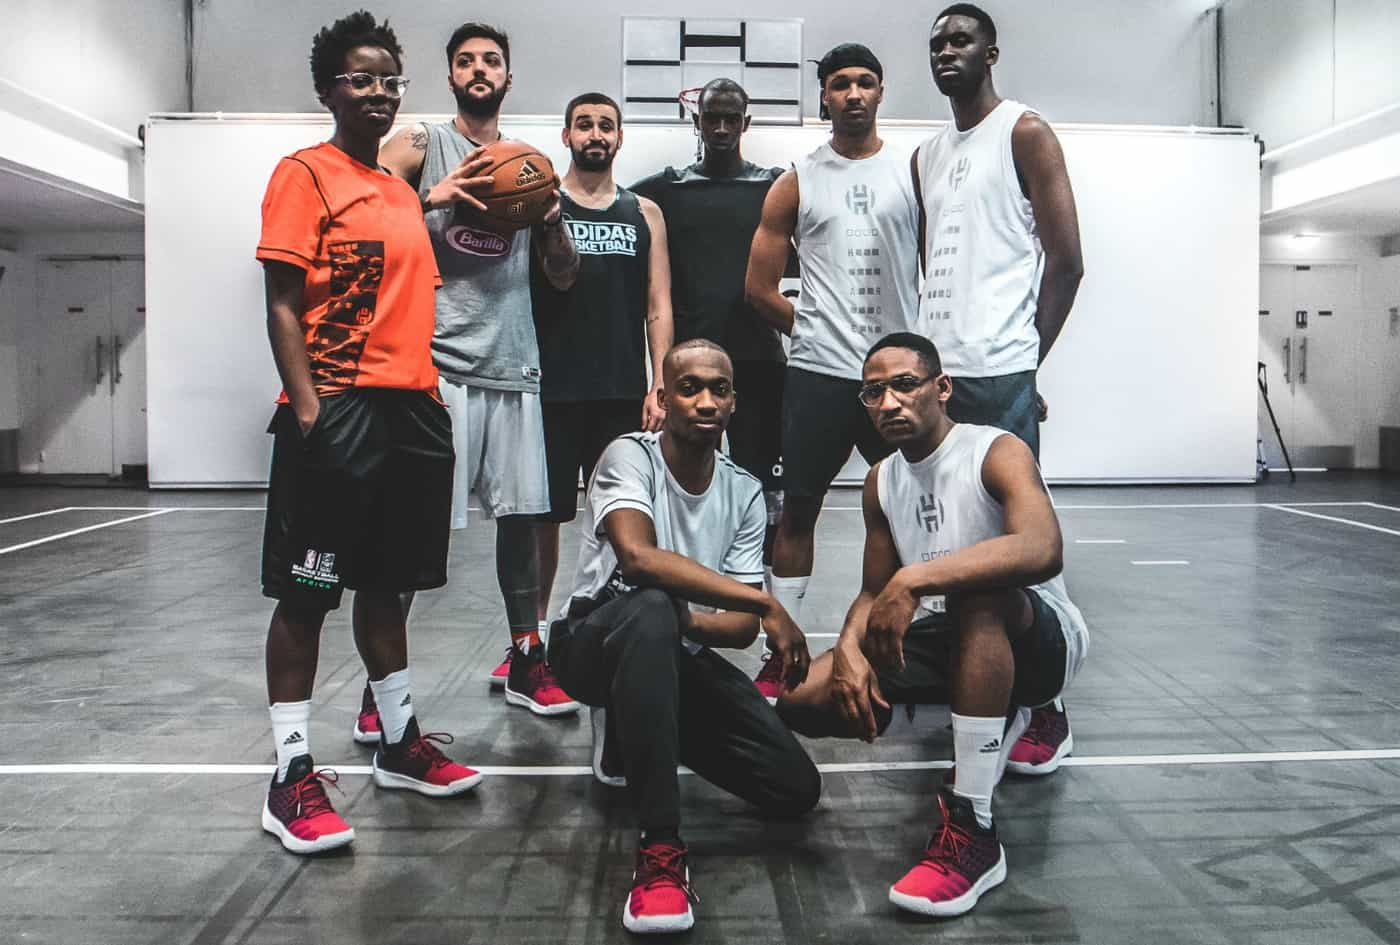 Les jeunes talents parisiens testent la adidas Harden Vol. 2